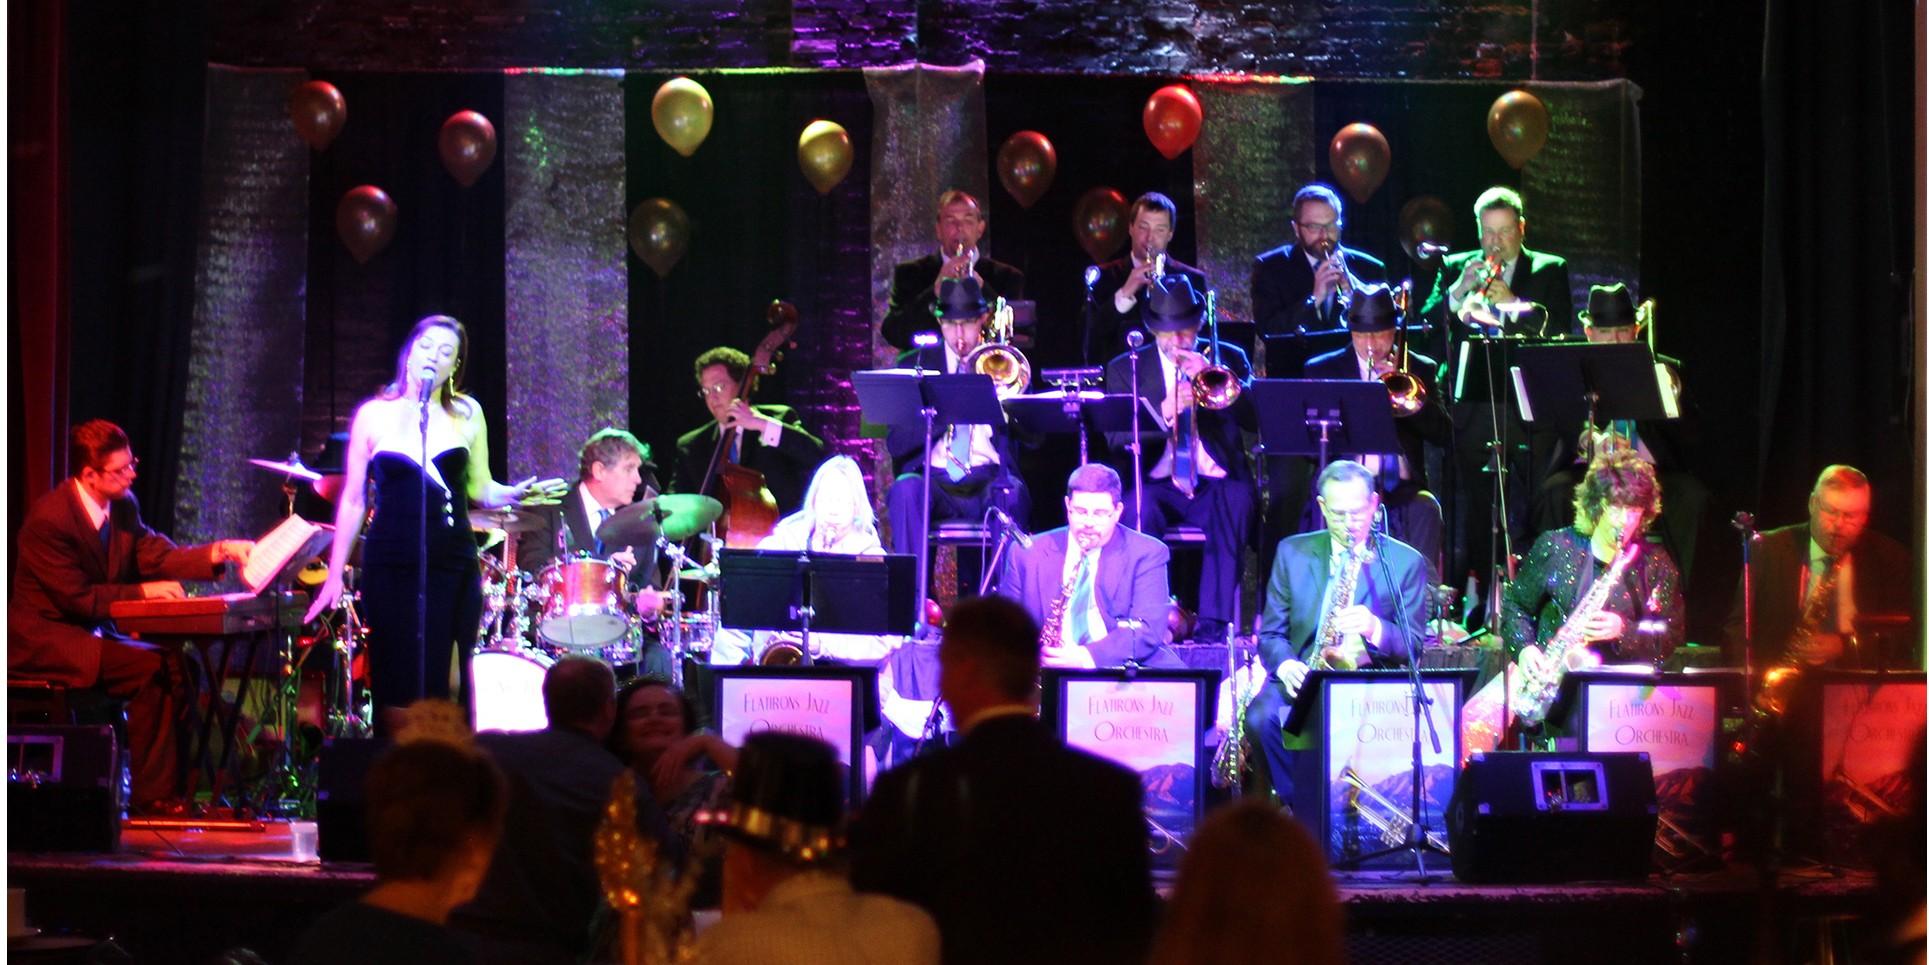 Flatirons Jazz Orchestra at Dickens Opera House